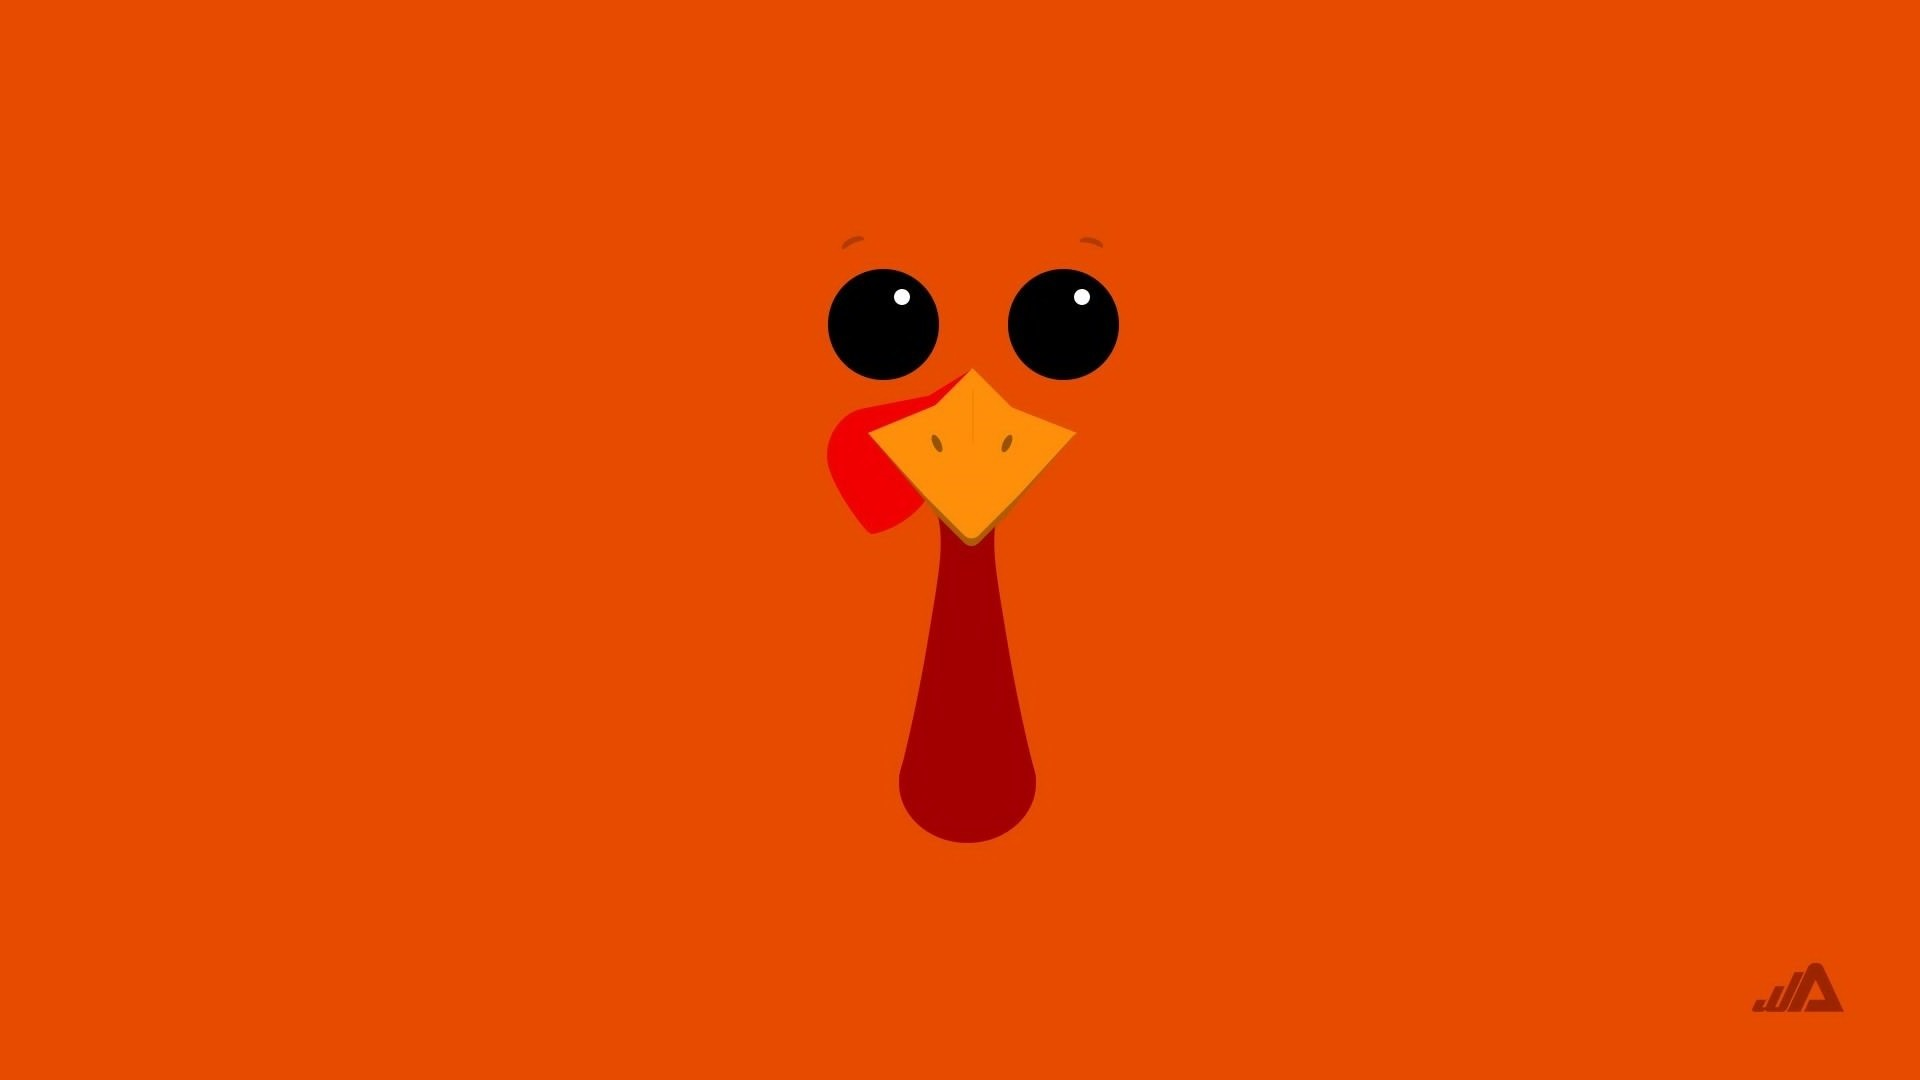 1920x1080 Cute Thanksgiving Screensavers